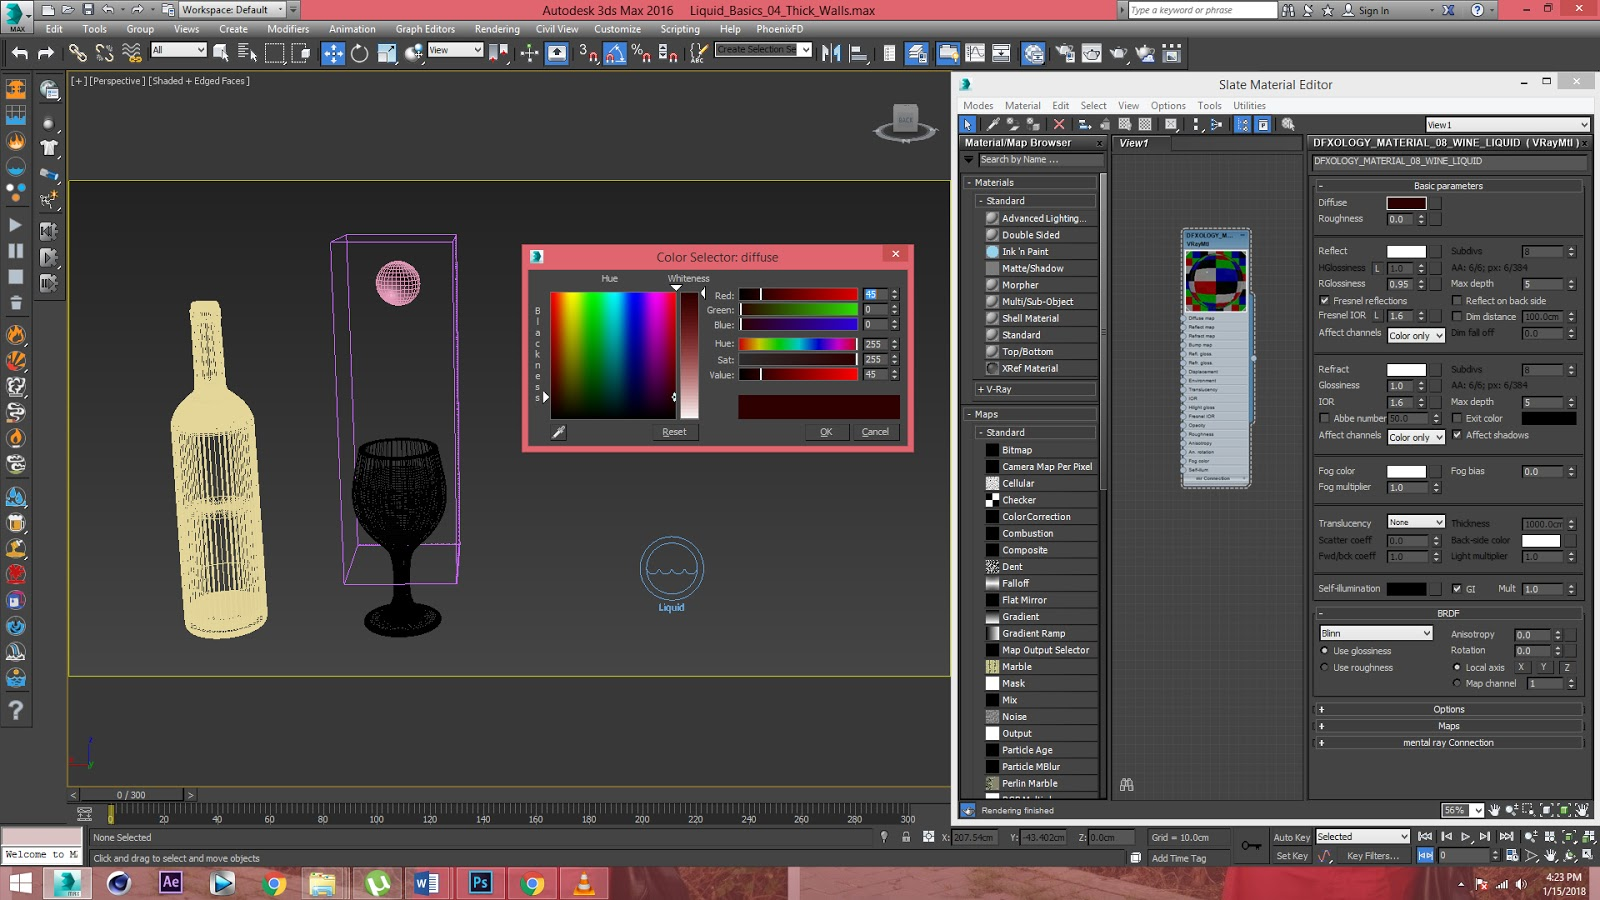 Liquid Simulation with Phoenix FD 3 0 - Ver 01 | DFX-ology